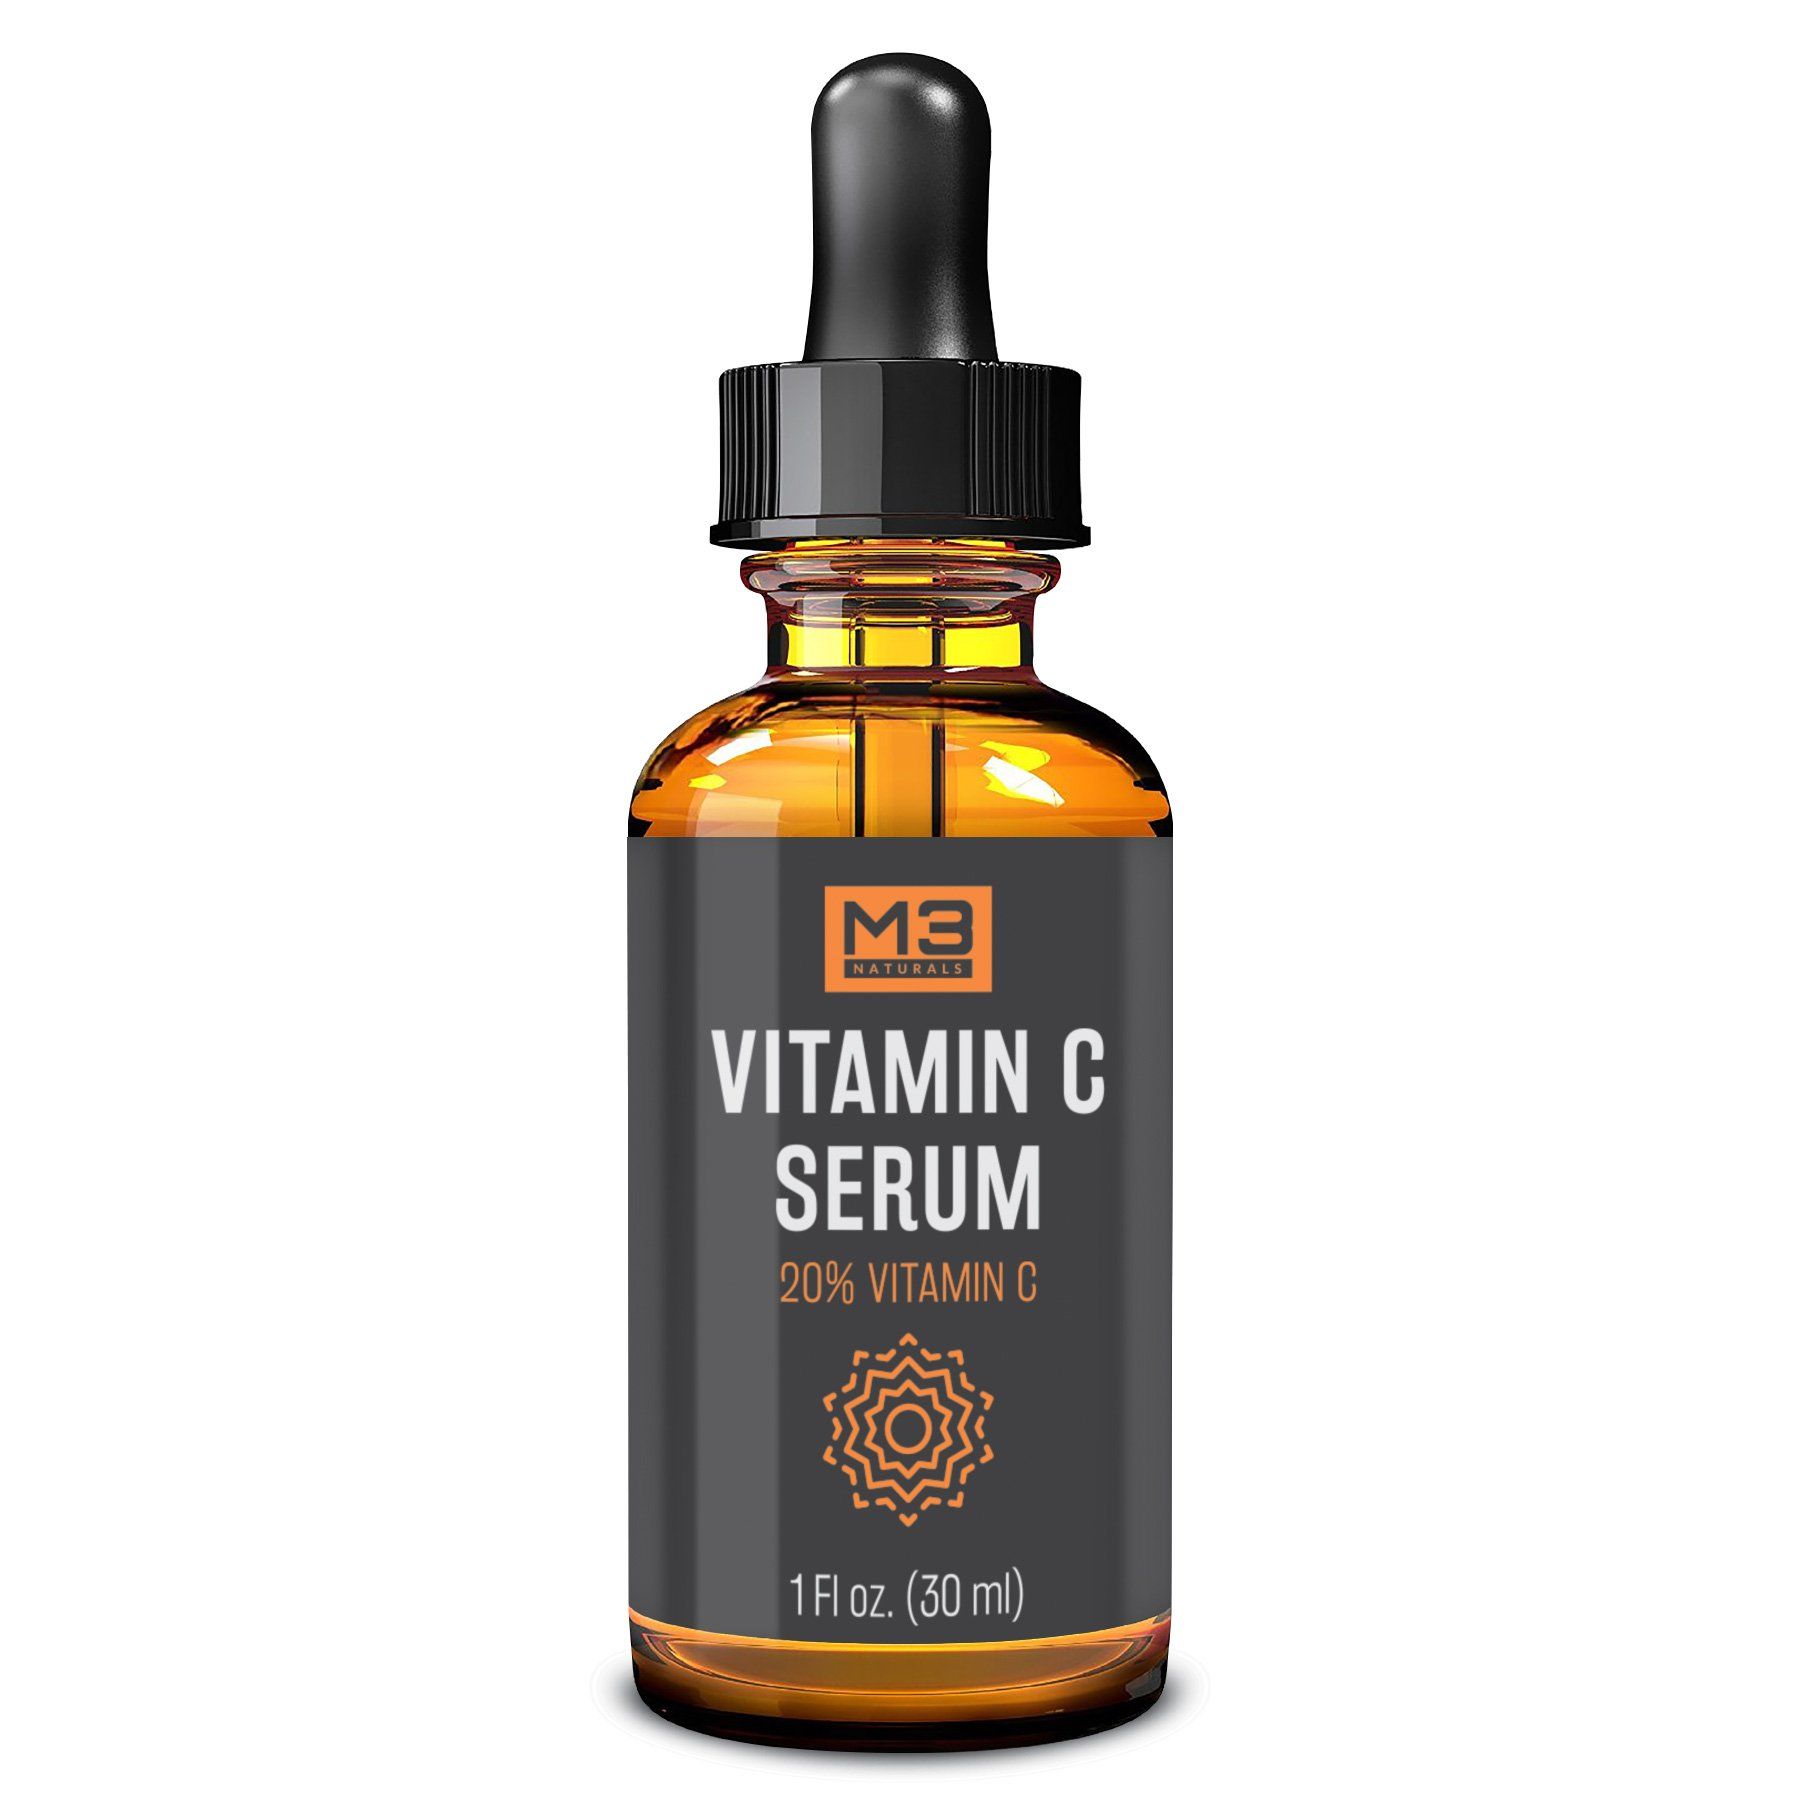 Premium Vitamin C Serum for Face, Anti-Aging Topical Facial Serum with Hyaluronic Acid + Vitamin E, 1 fl oz.